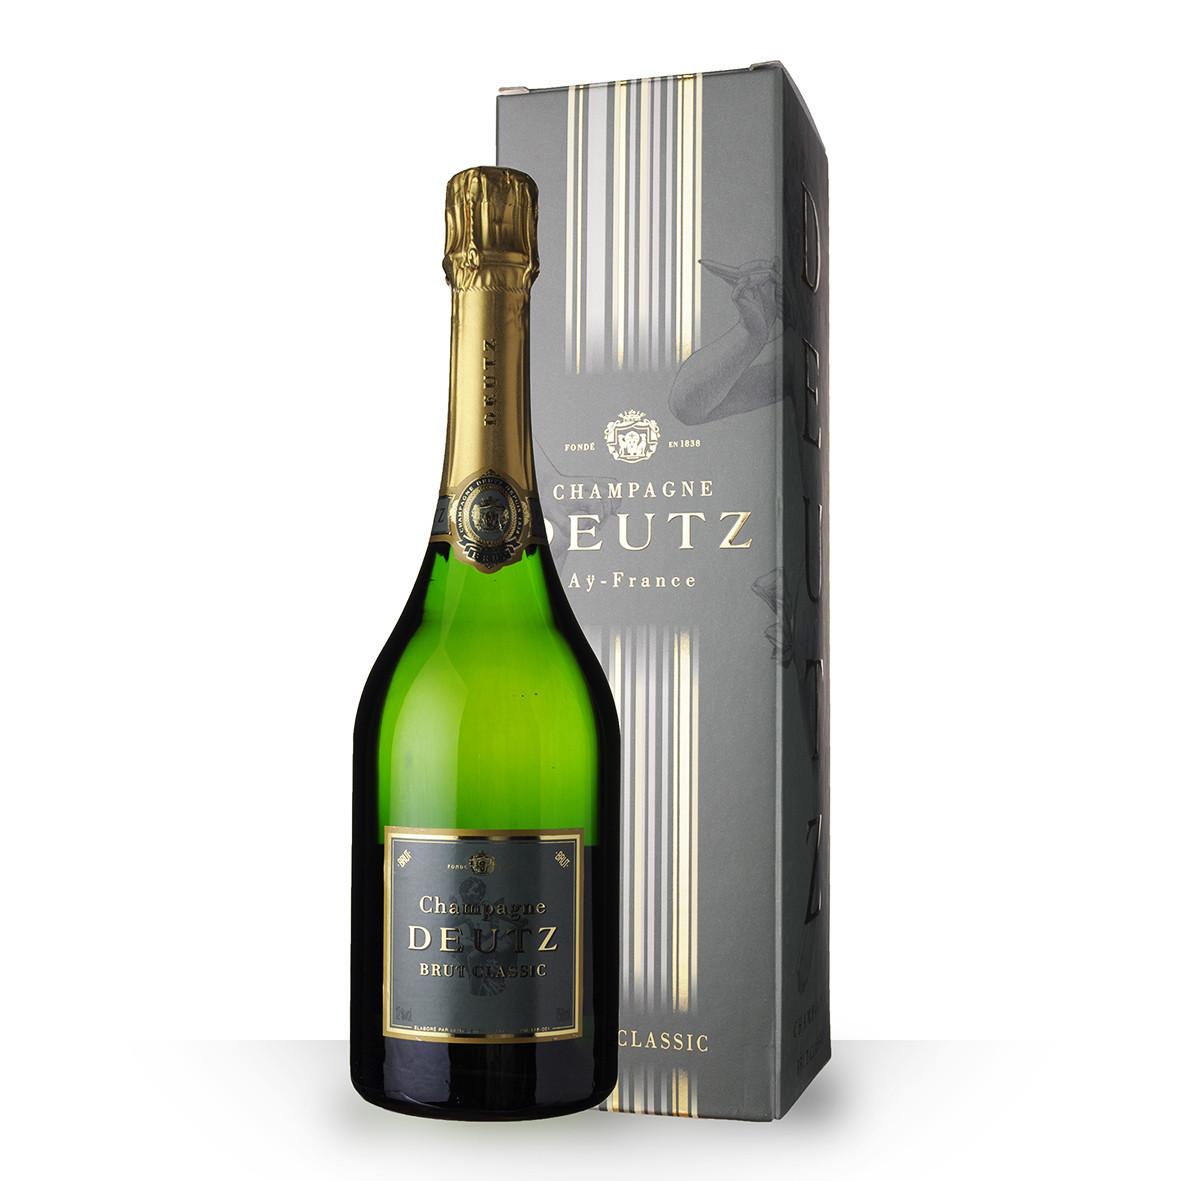 Champagne Deutz Brut Classic 75cl Etui www.odyssee-vins.com